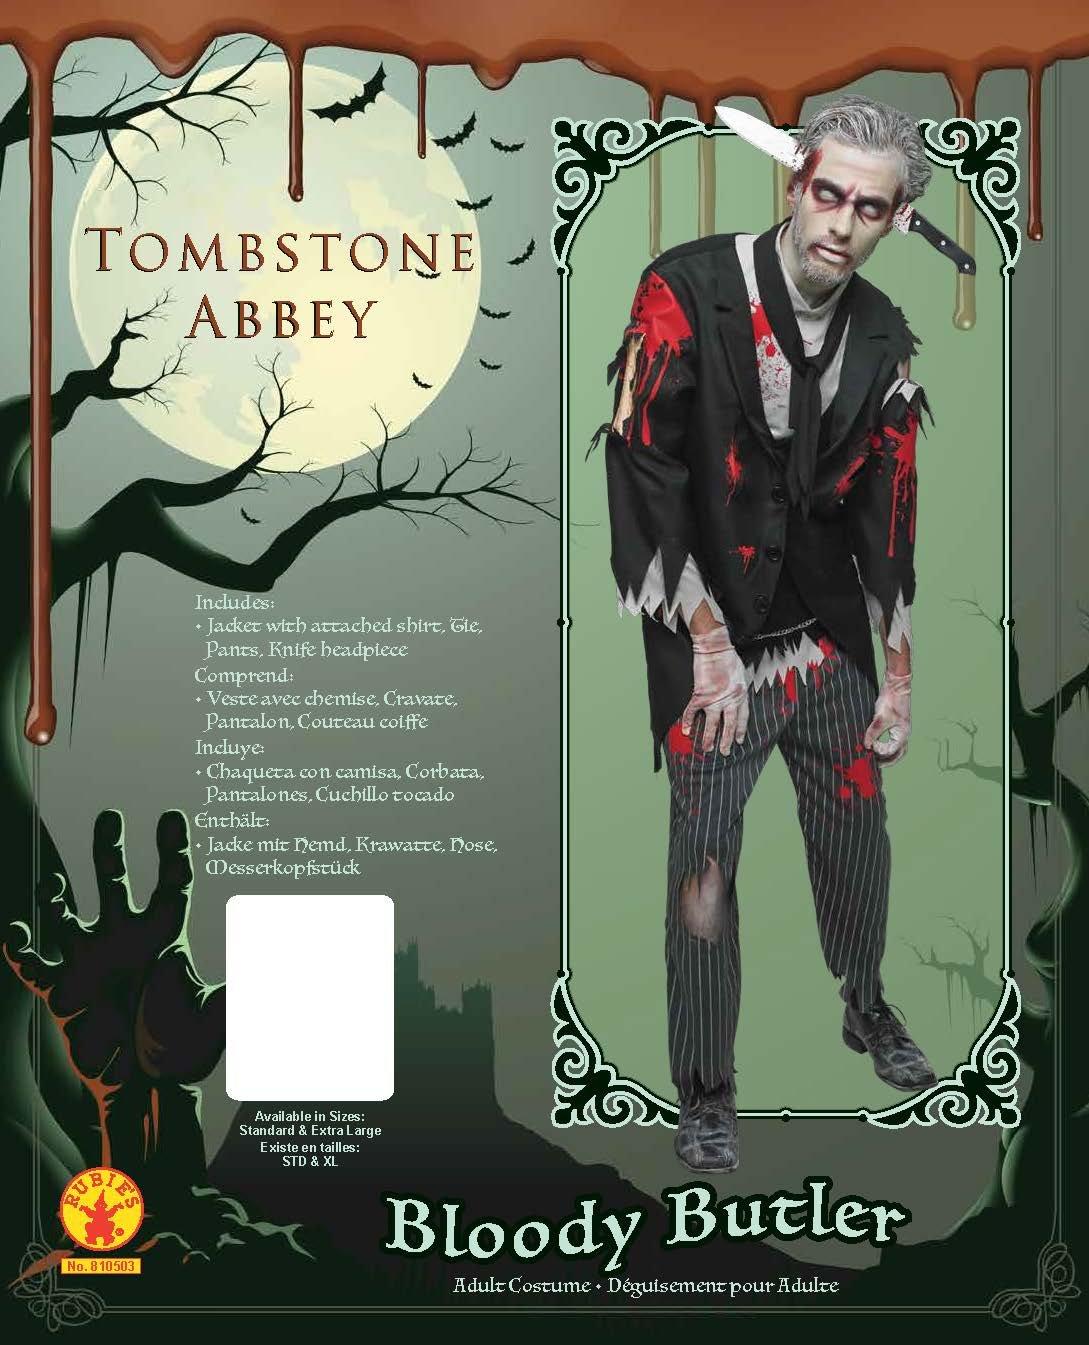 Bloody Zombie Butler, Herren Kostüm, Halloween, Horror, Erwachsene, Kostüm, Outfit, Mehrfarbig, XL